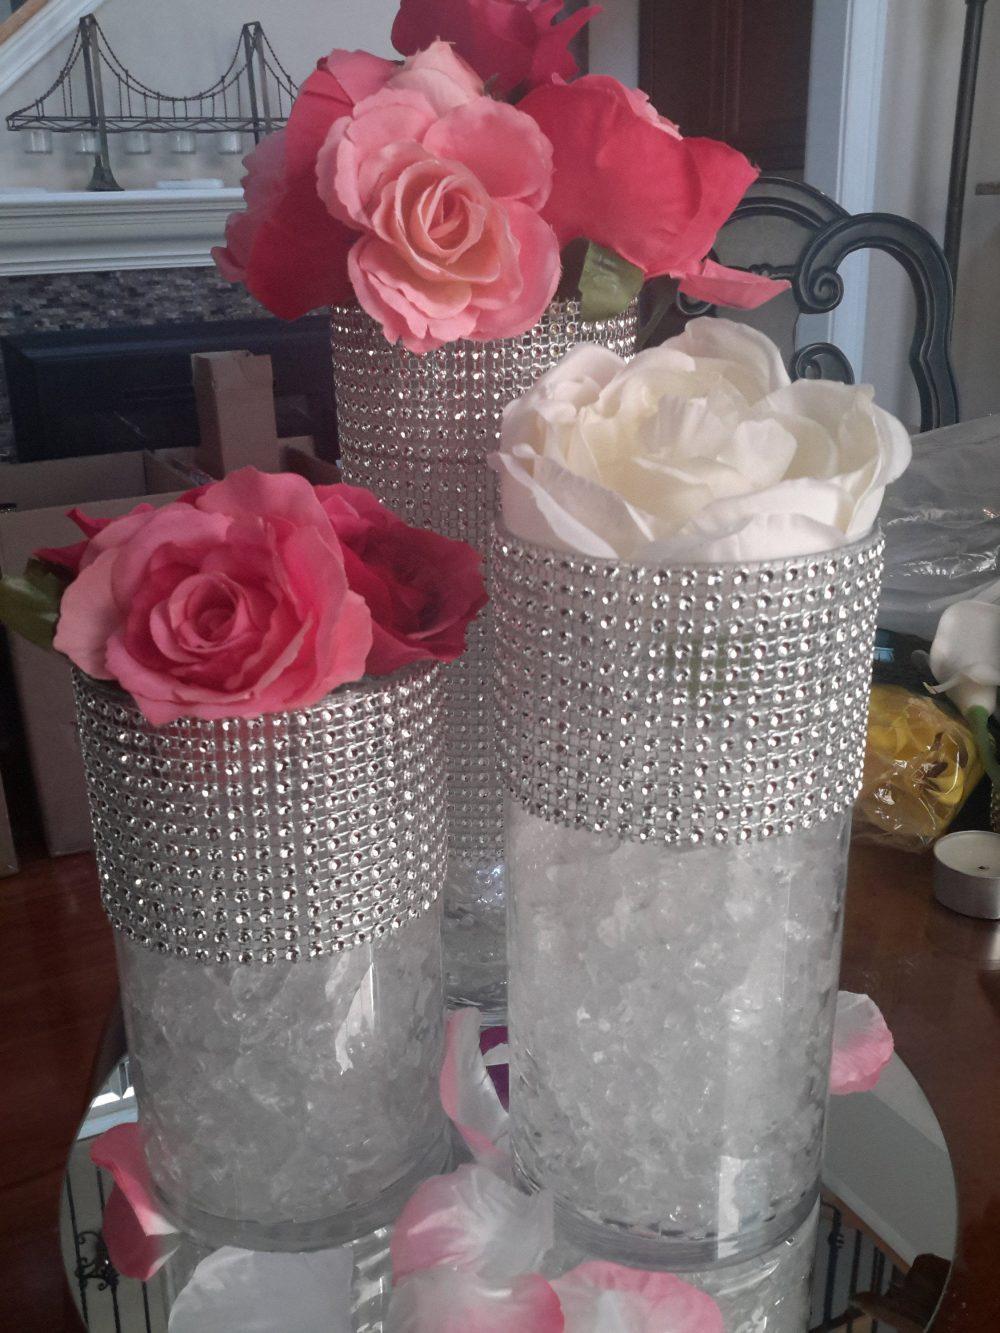 Cylinder Vase Floral Set Of 3 With Bling-Flower Centerpiece-Baptism-1st Communion-Quinceañera-Sweet 16-Shower-Birthday - Tea Party-Wedding